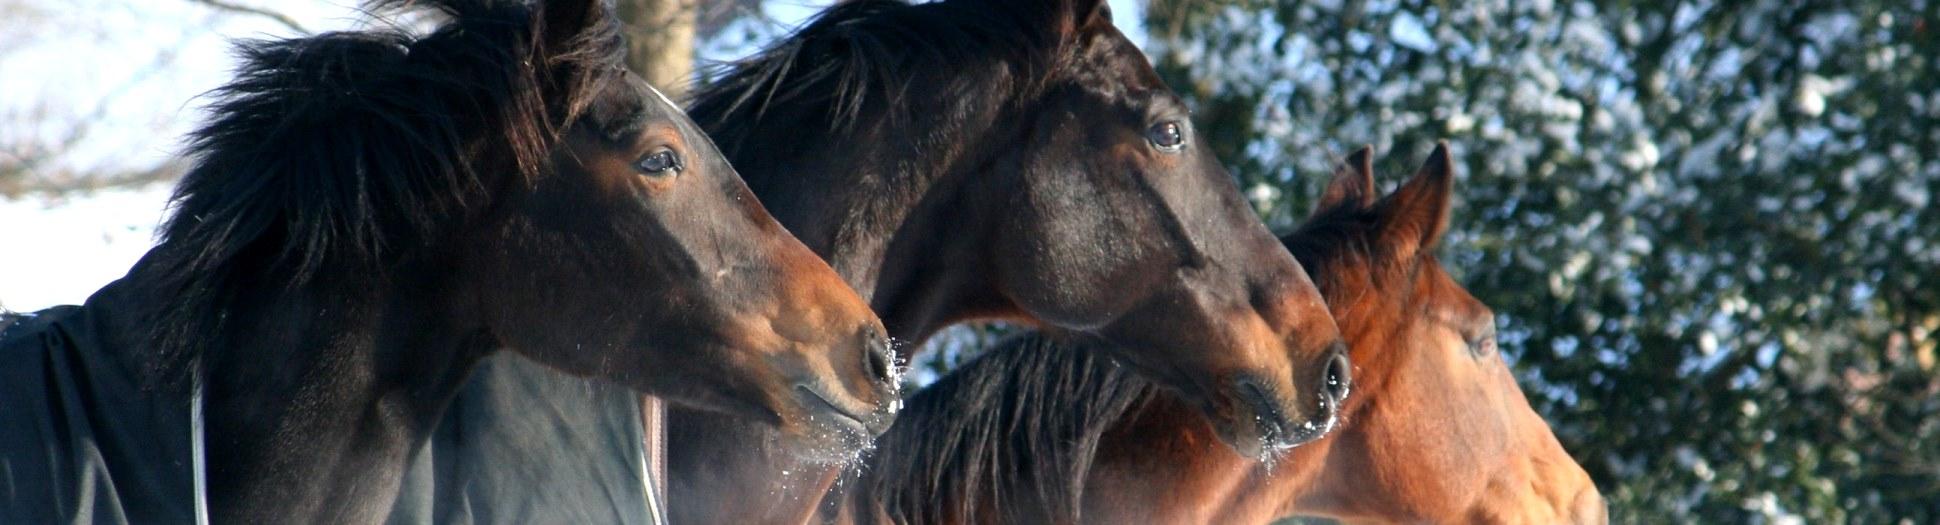 Blog - Horse Power Life Power